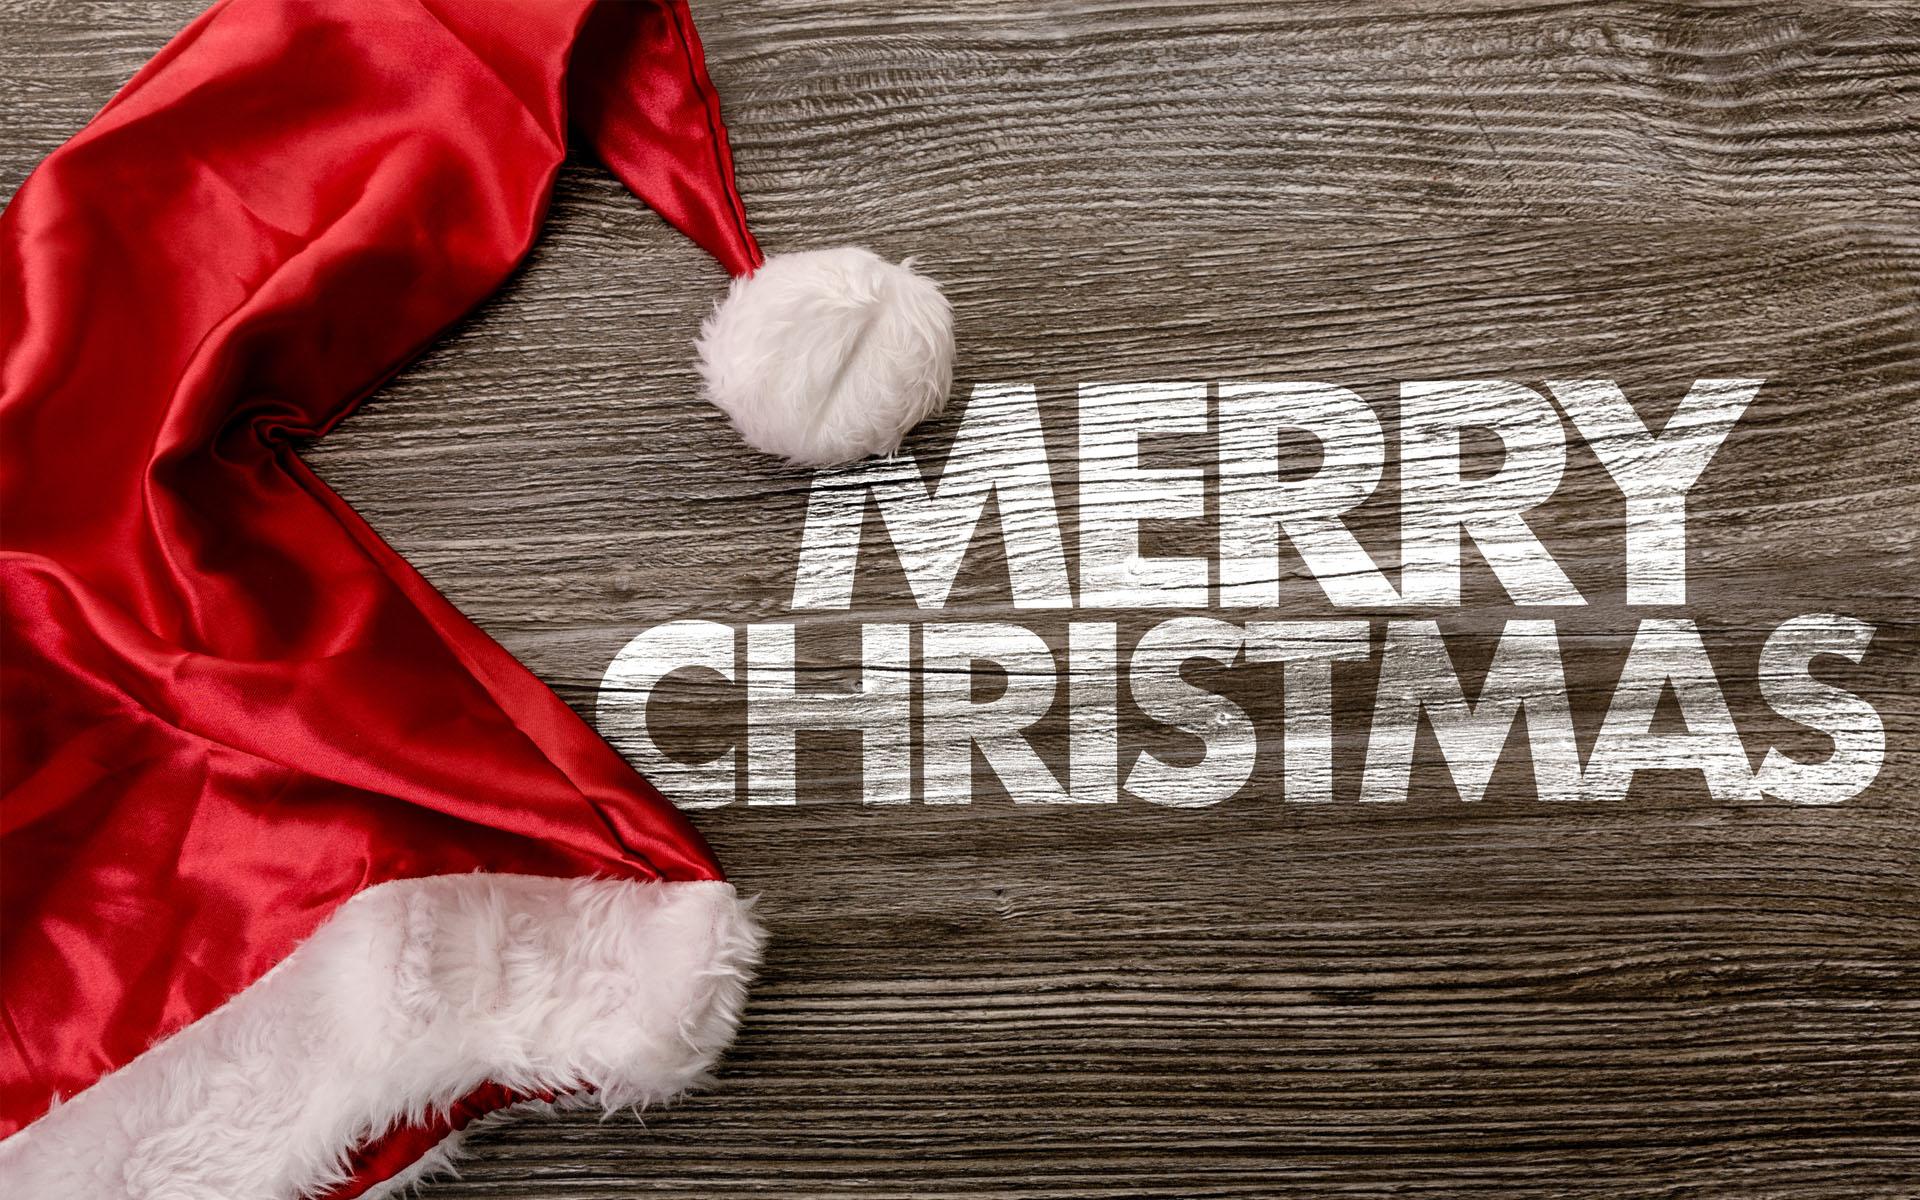 Merry christmas bilder - Merry Christmas Bilder